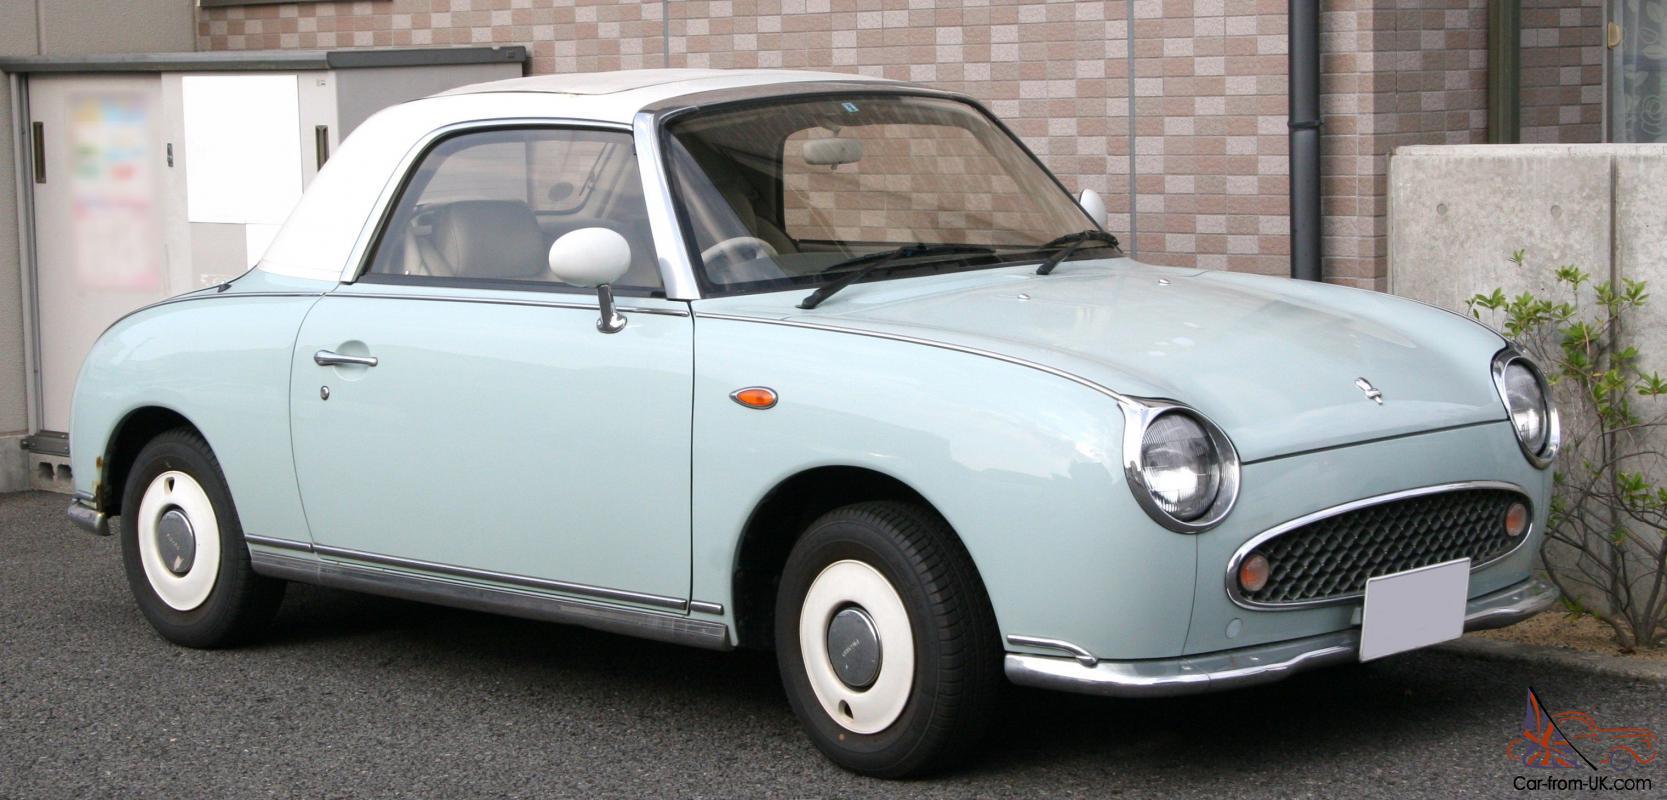 Nissan Figaro - car classics